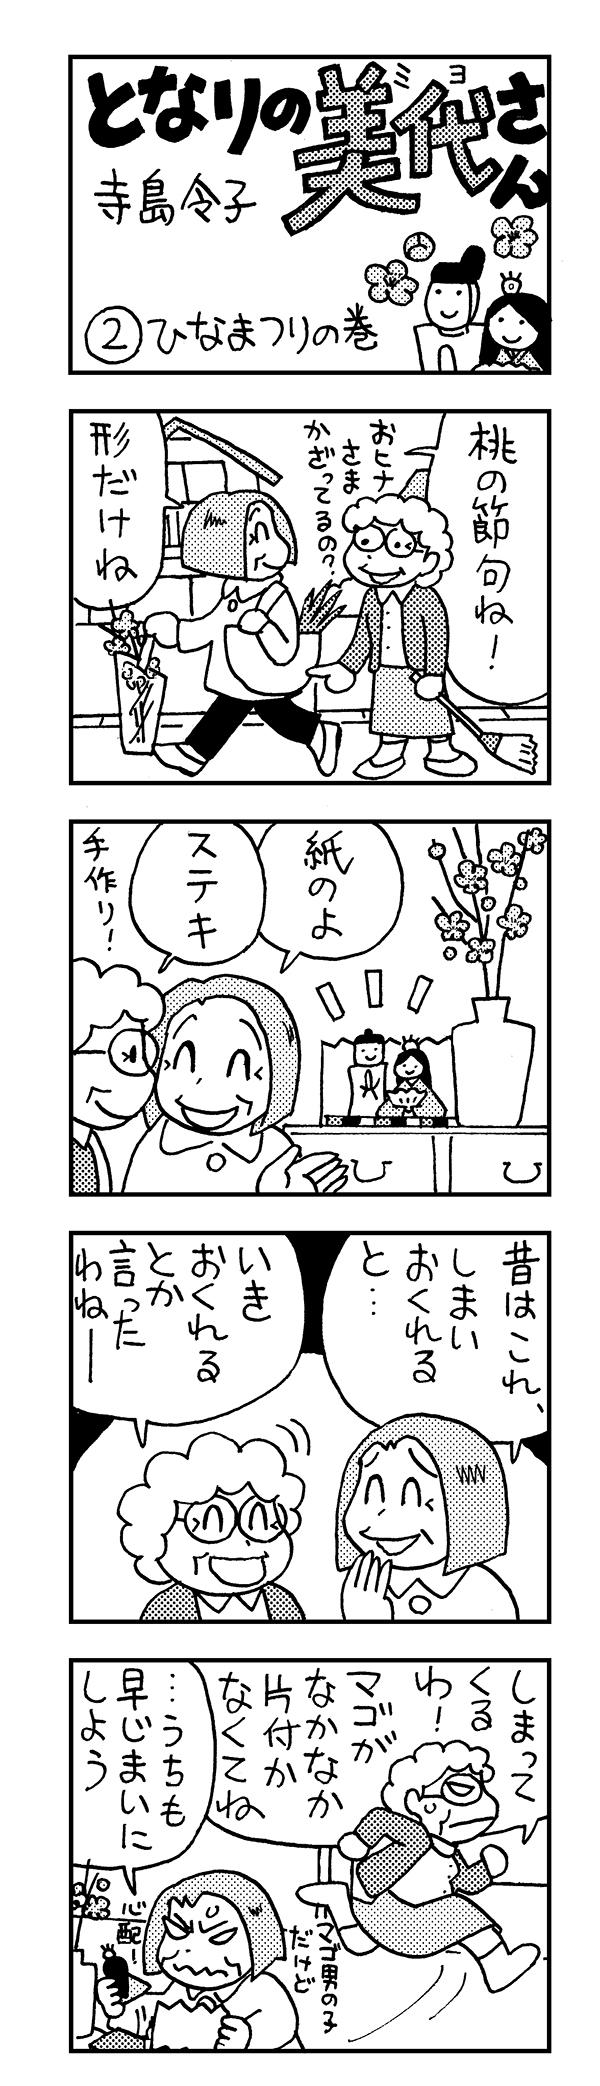 日本薬師堂会報誌掲載4コマ漫画 第2弾の画像1枚目